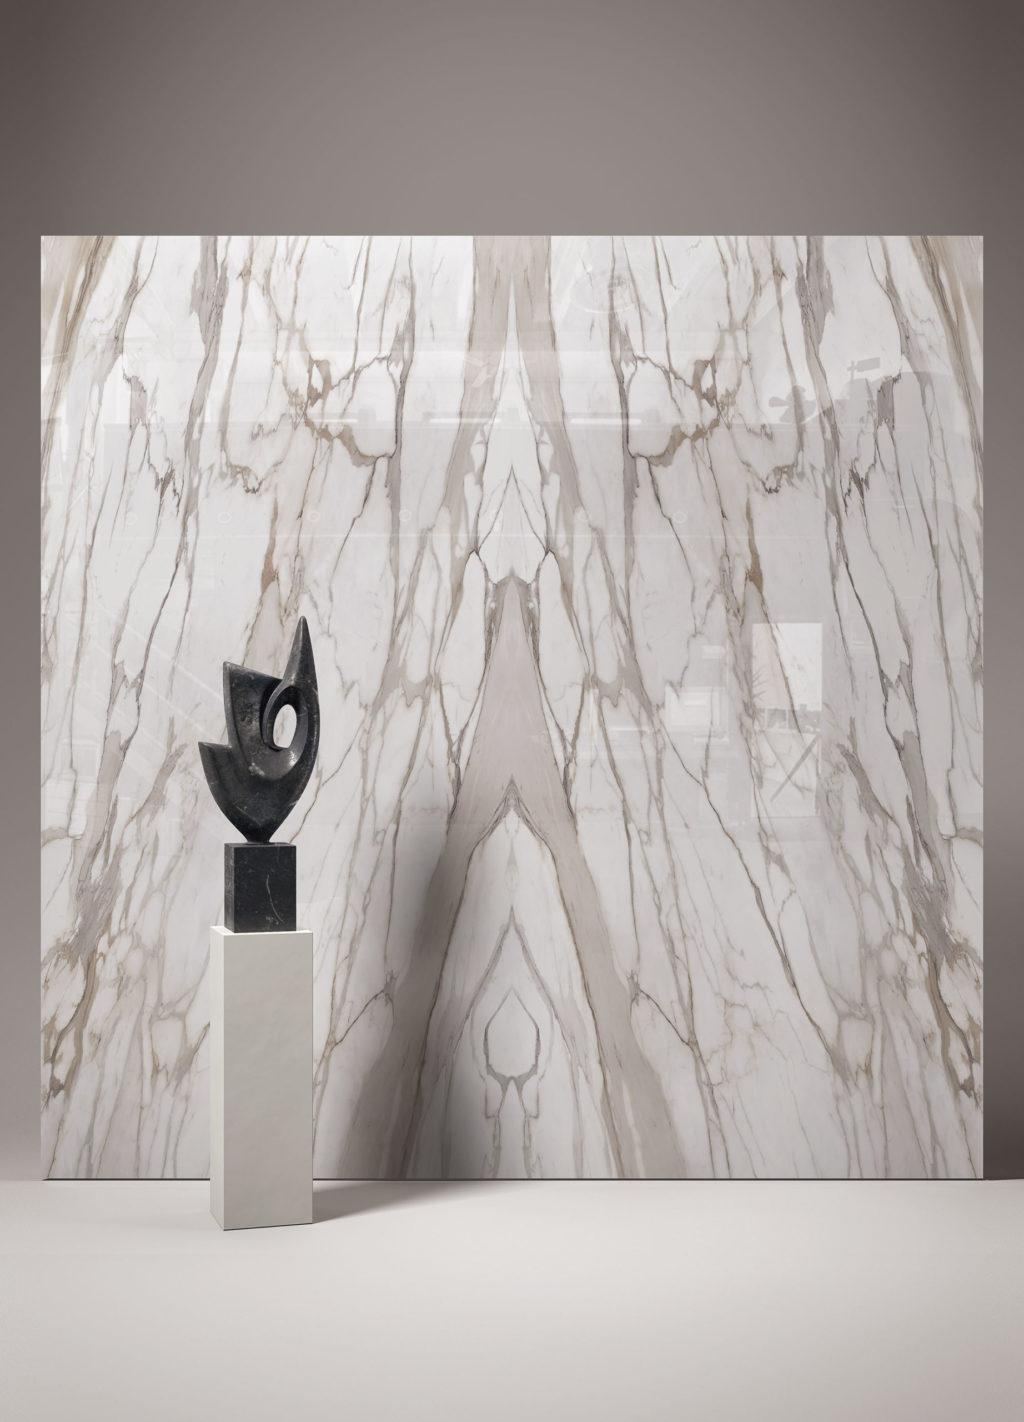 https://desidea.hu/wp-content/uploads/fly-images/162512/level-marmi-marvany-koporcelan-emil-ceramica-calacatta-gold4-scaled-1024x0.jpg